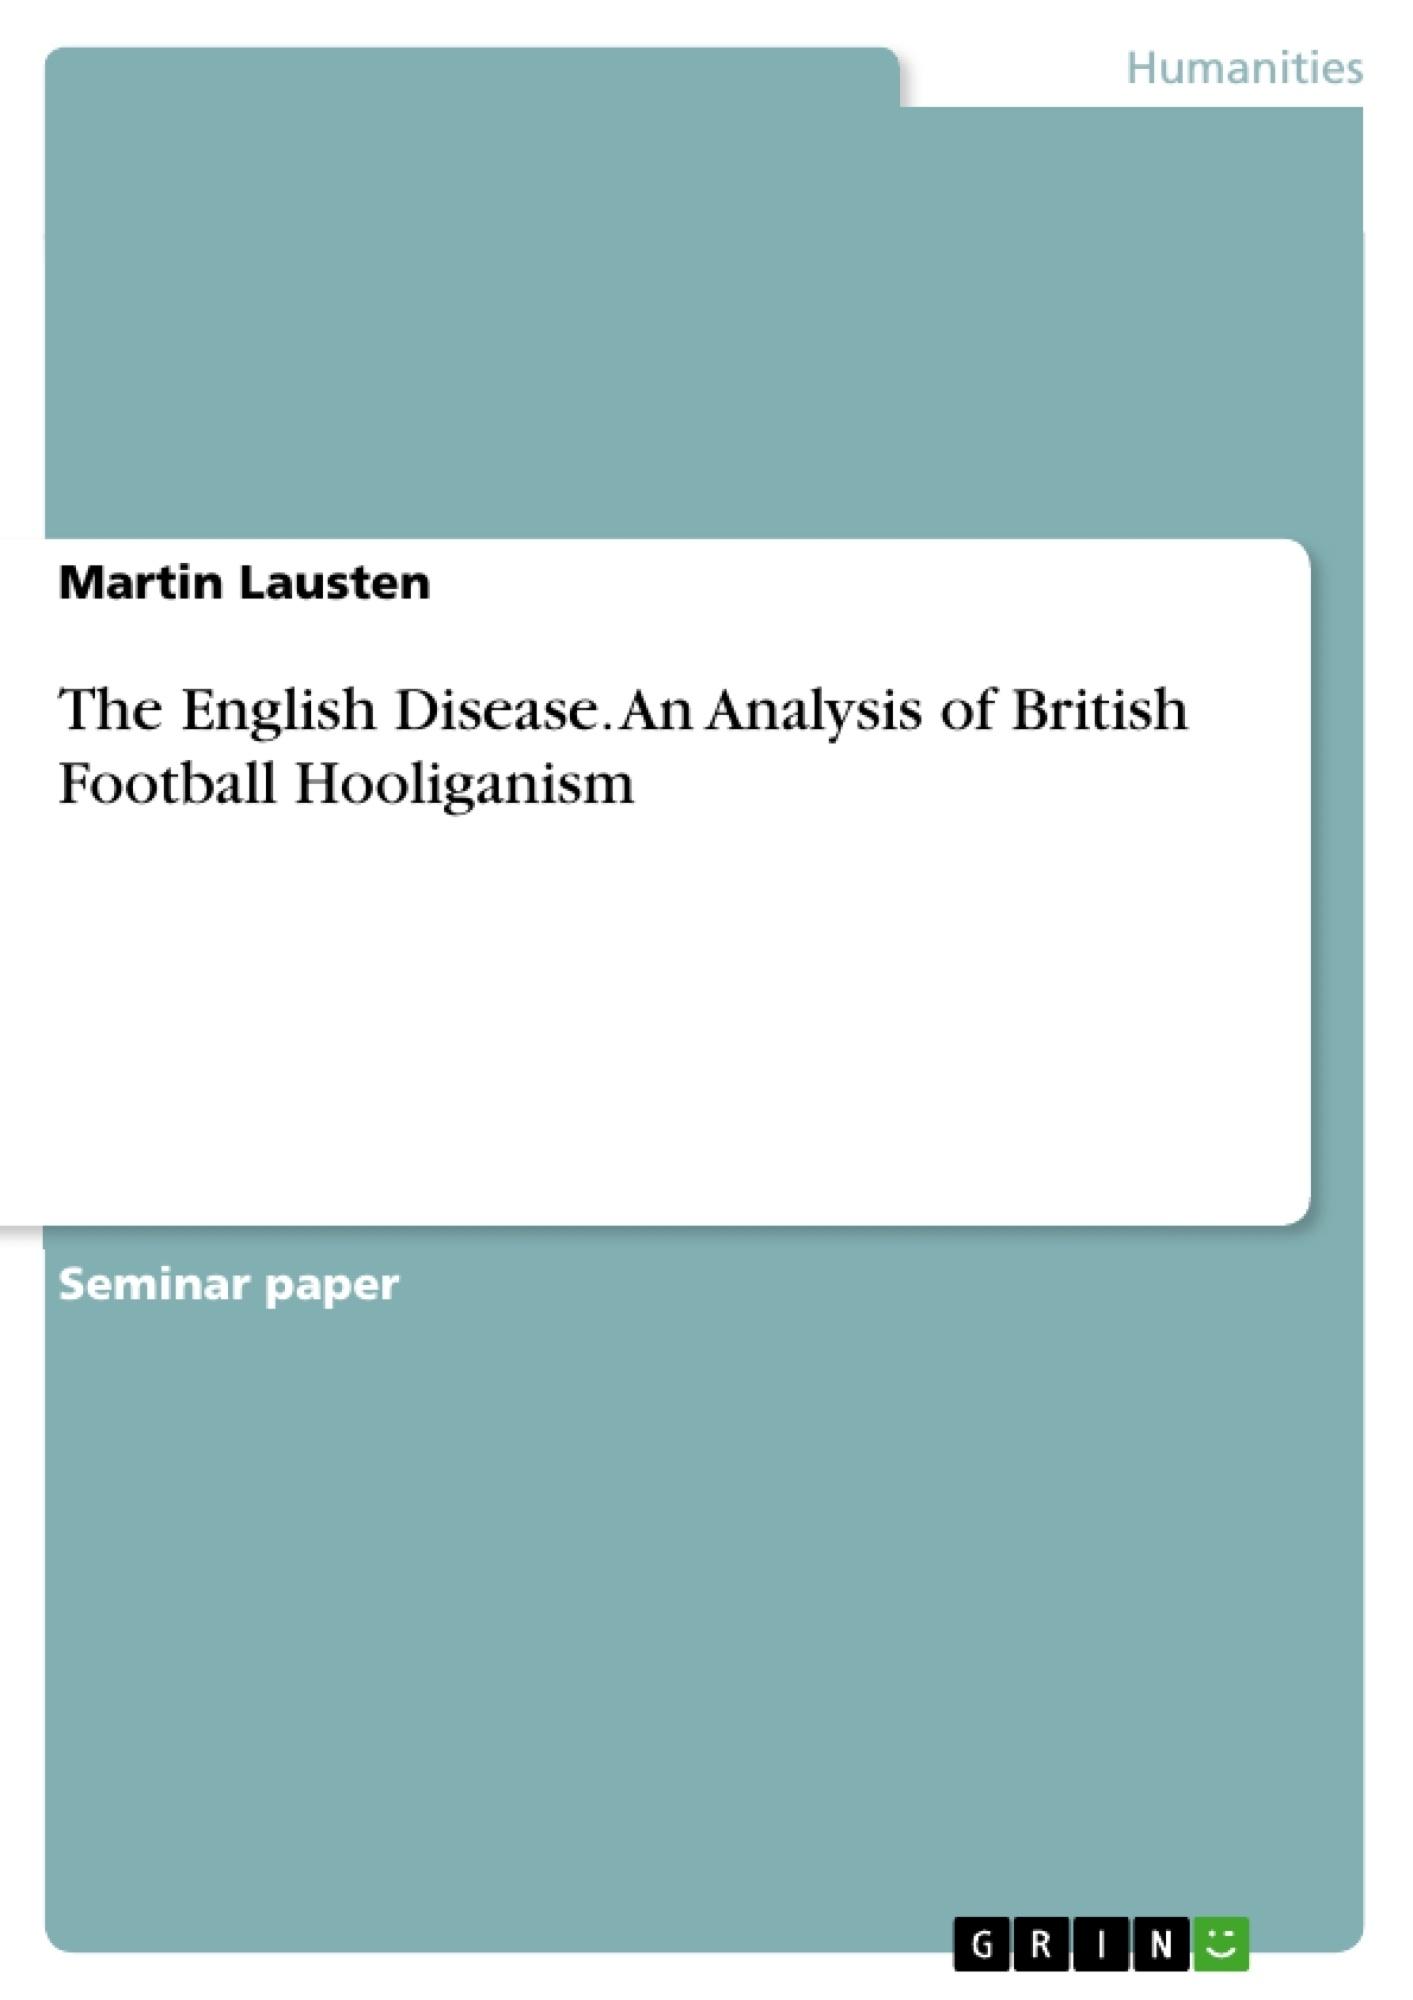 Title: The English Disease. An Analysis of British Football Hooliganism